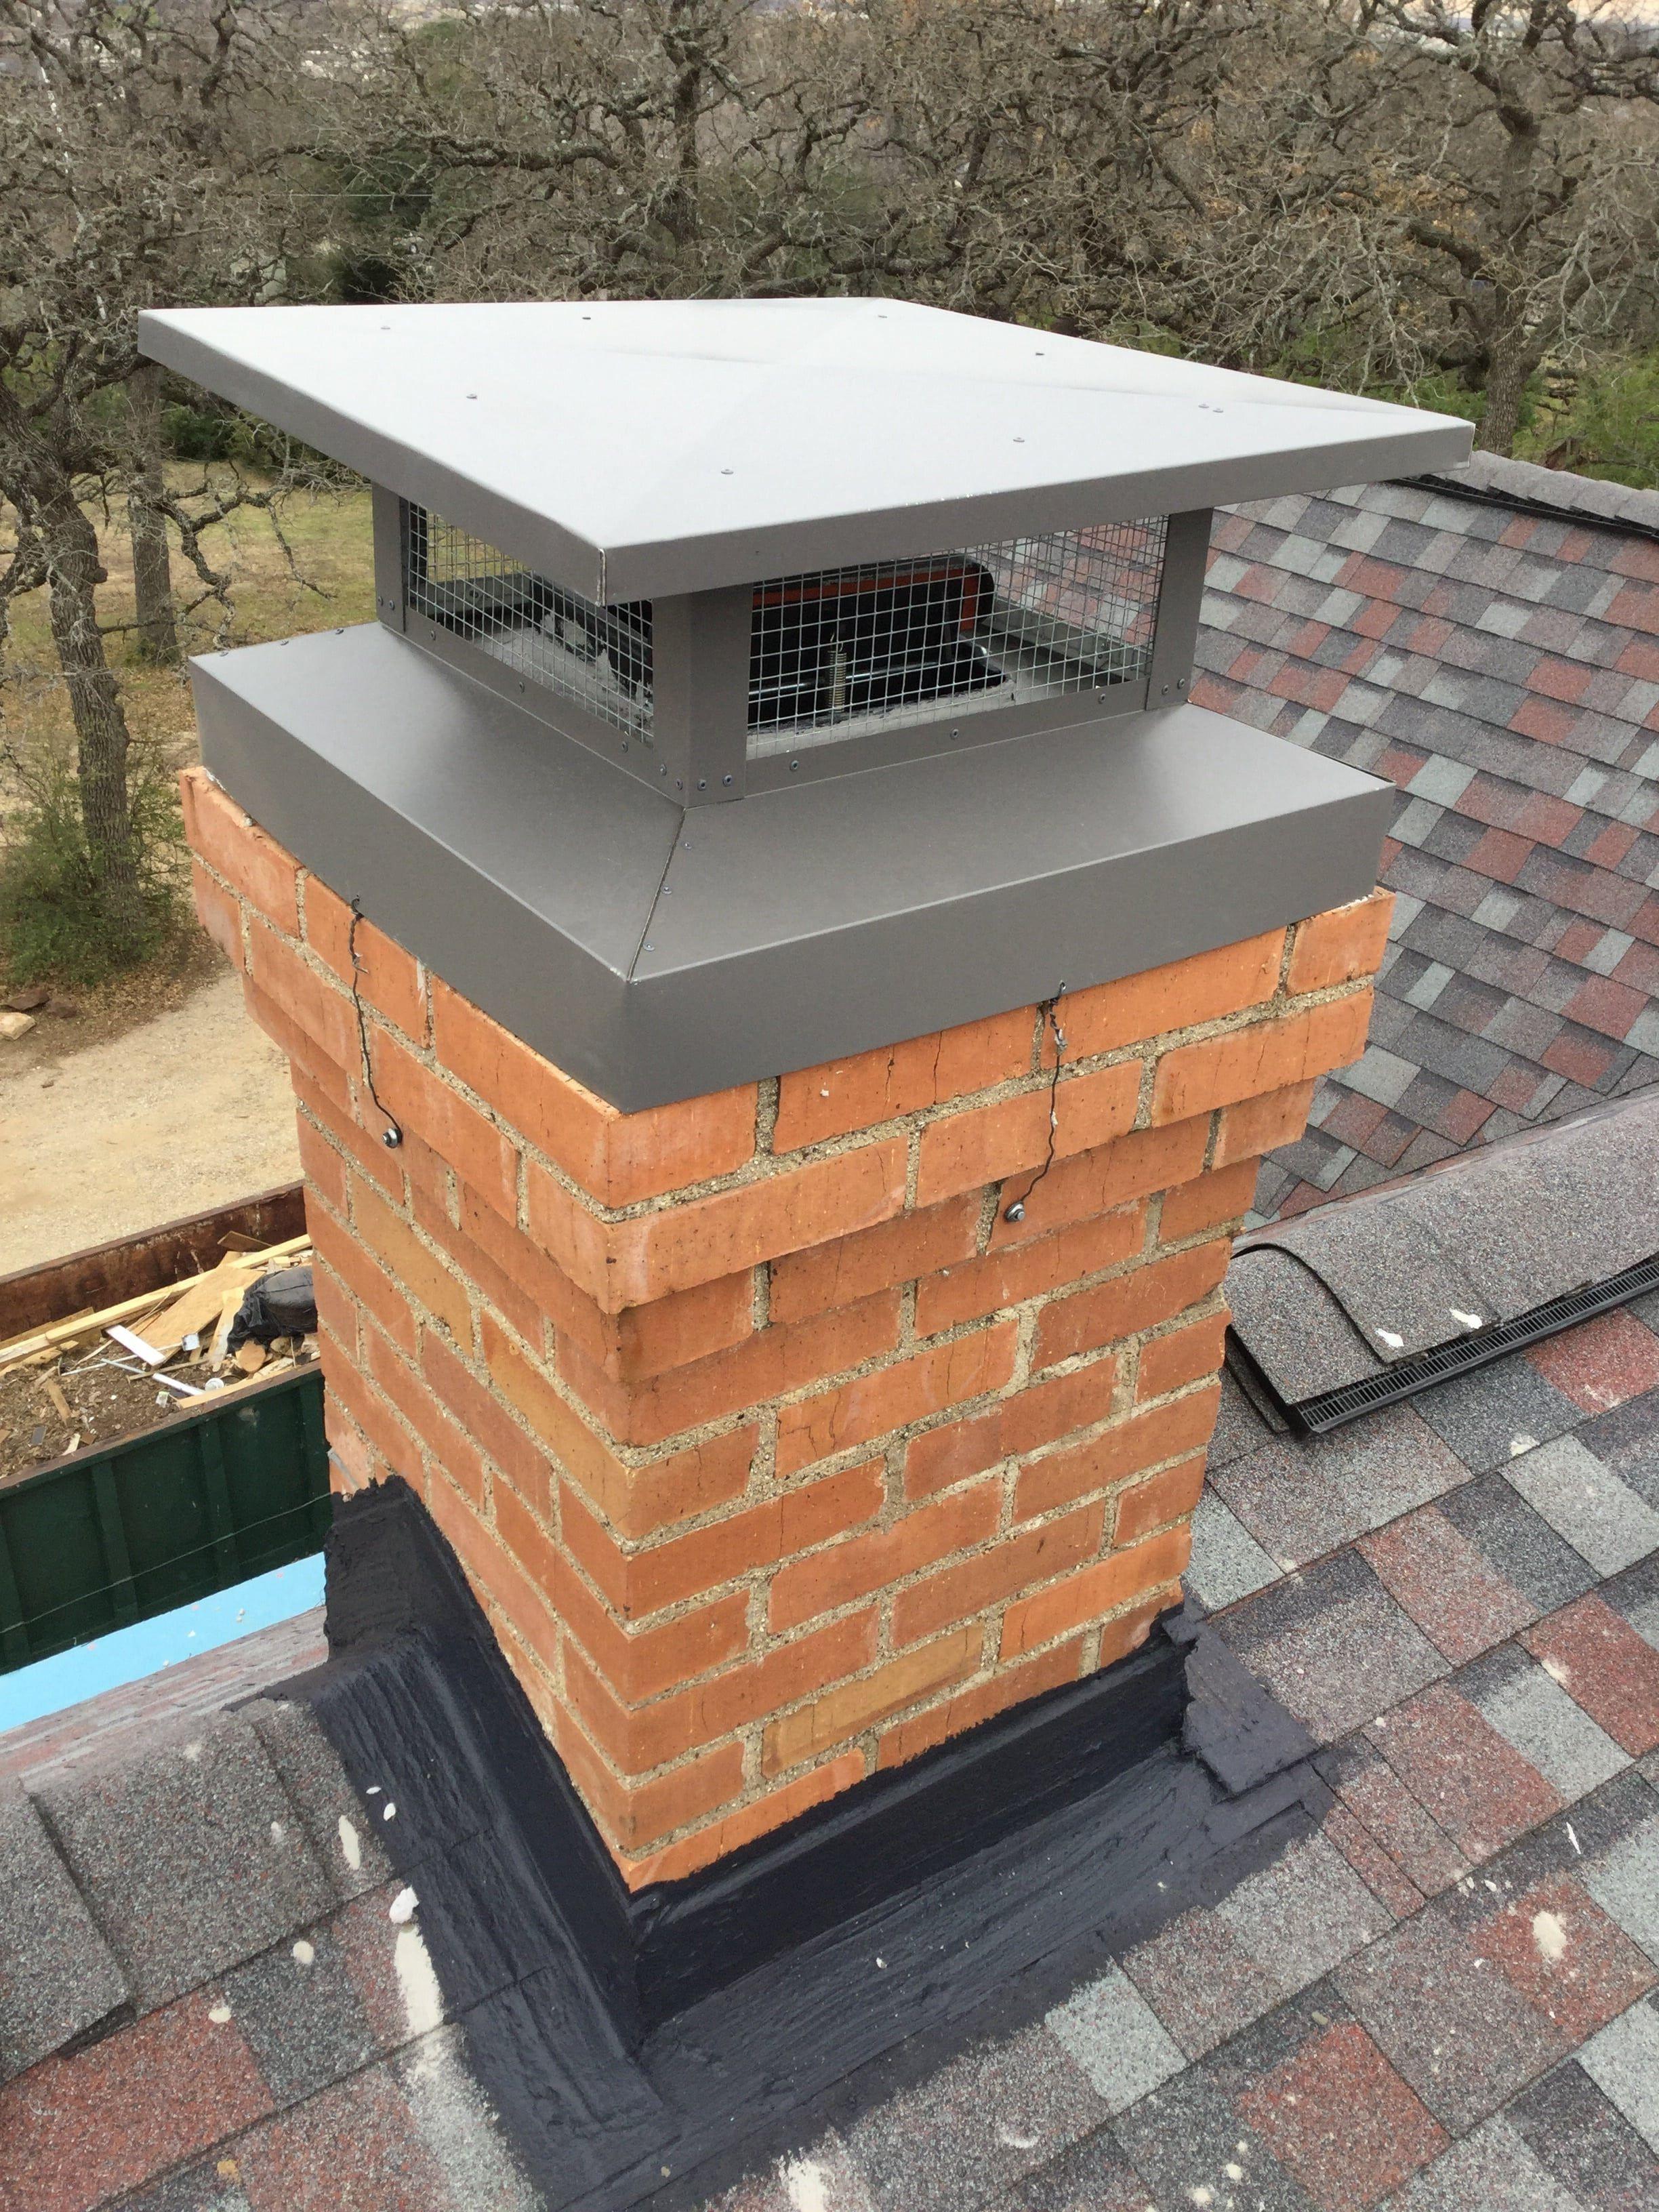 1 Chimney For Rain In 2020 Chimney Cap Chimney Design Door Gate Design